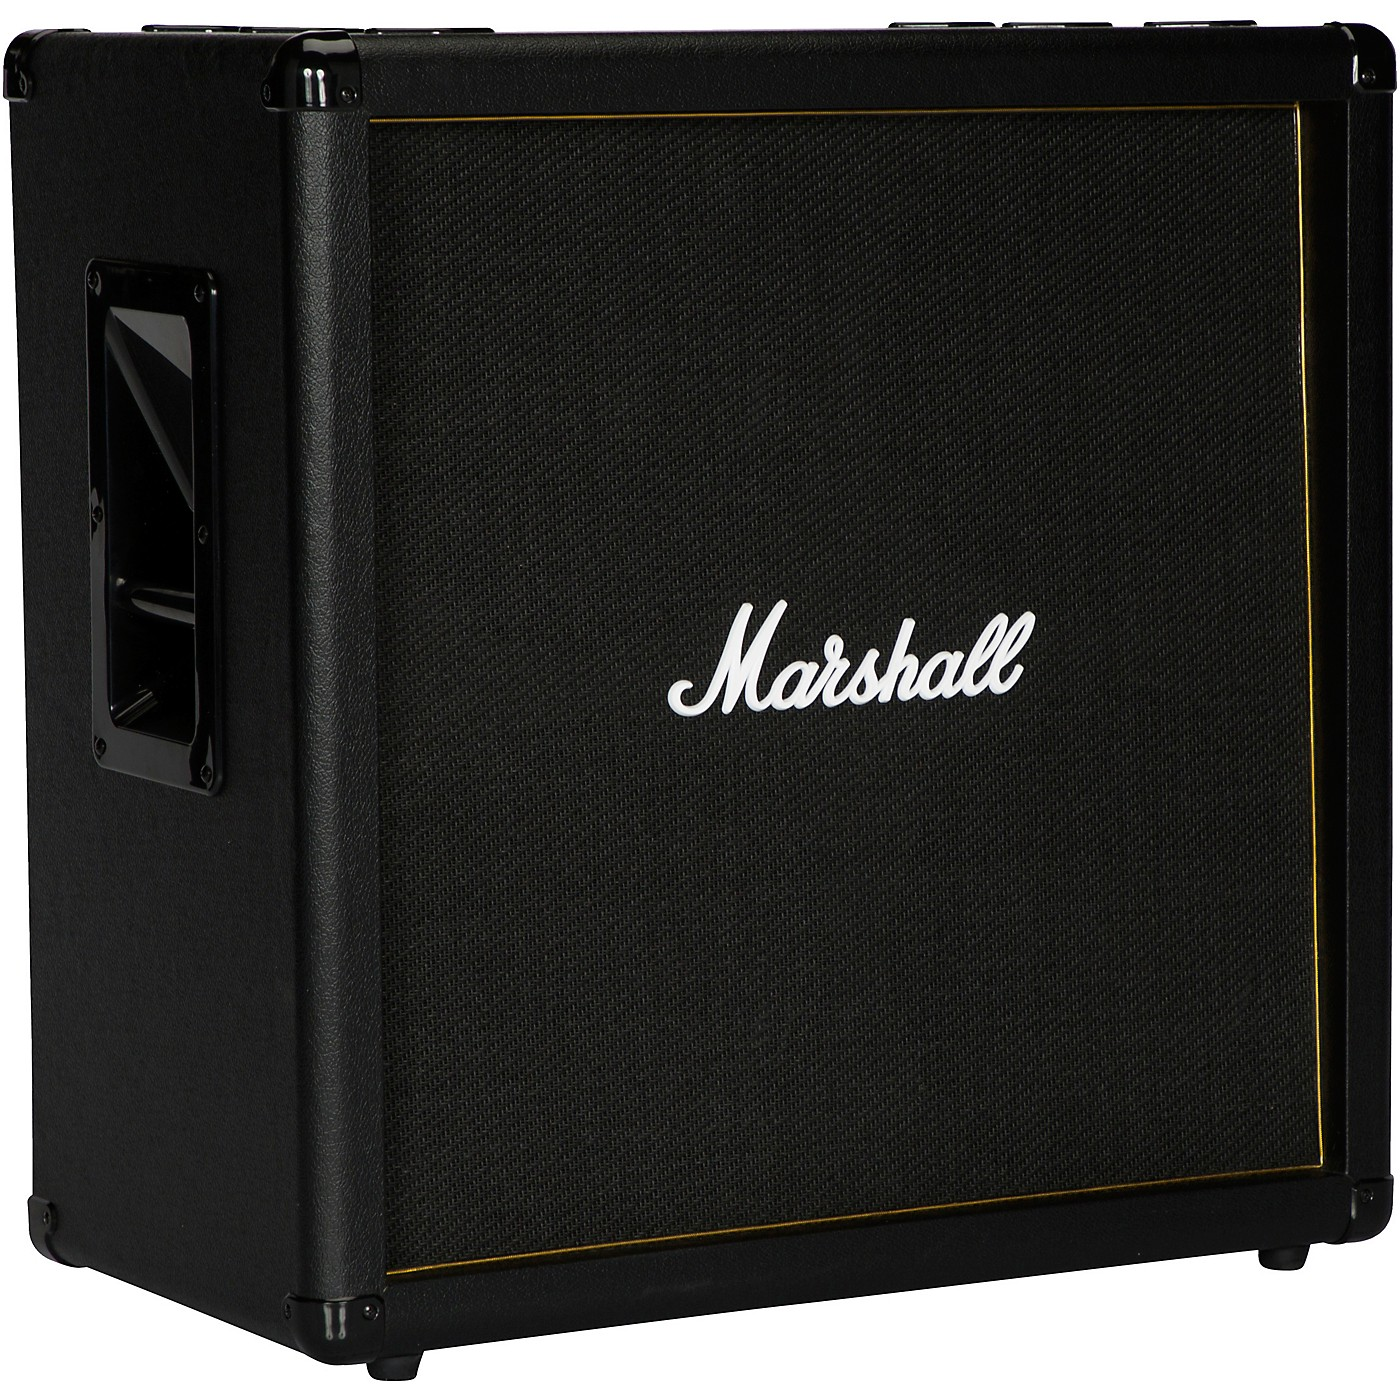 Marshall MG412BG 120W 4x12 Straight Guitar Speaker Cabinet thumbnail